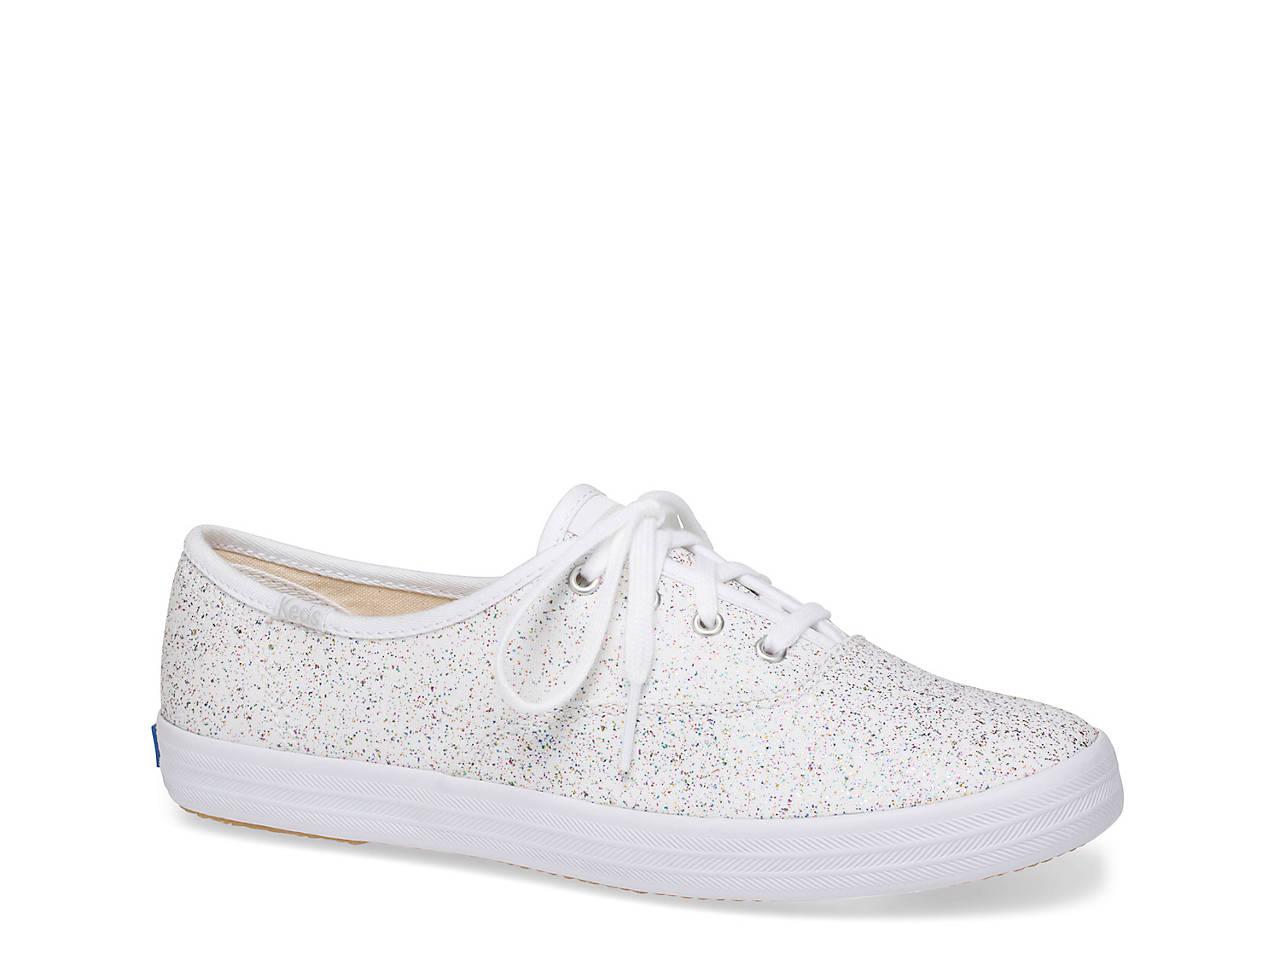 89418466a Keds Champion Starlight Sneaker - Women s Women s Shoes